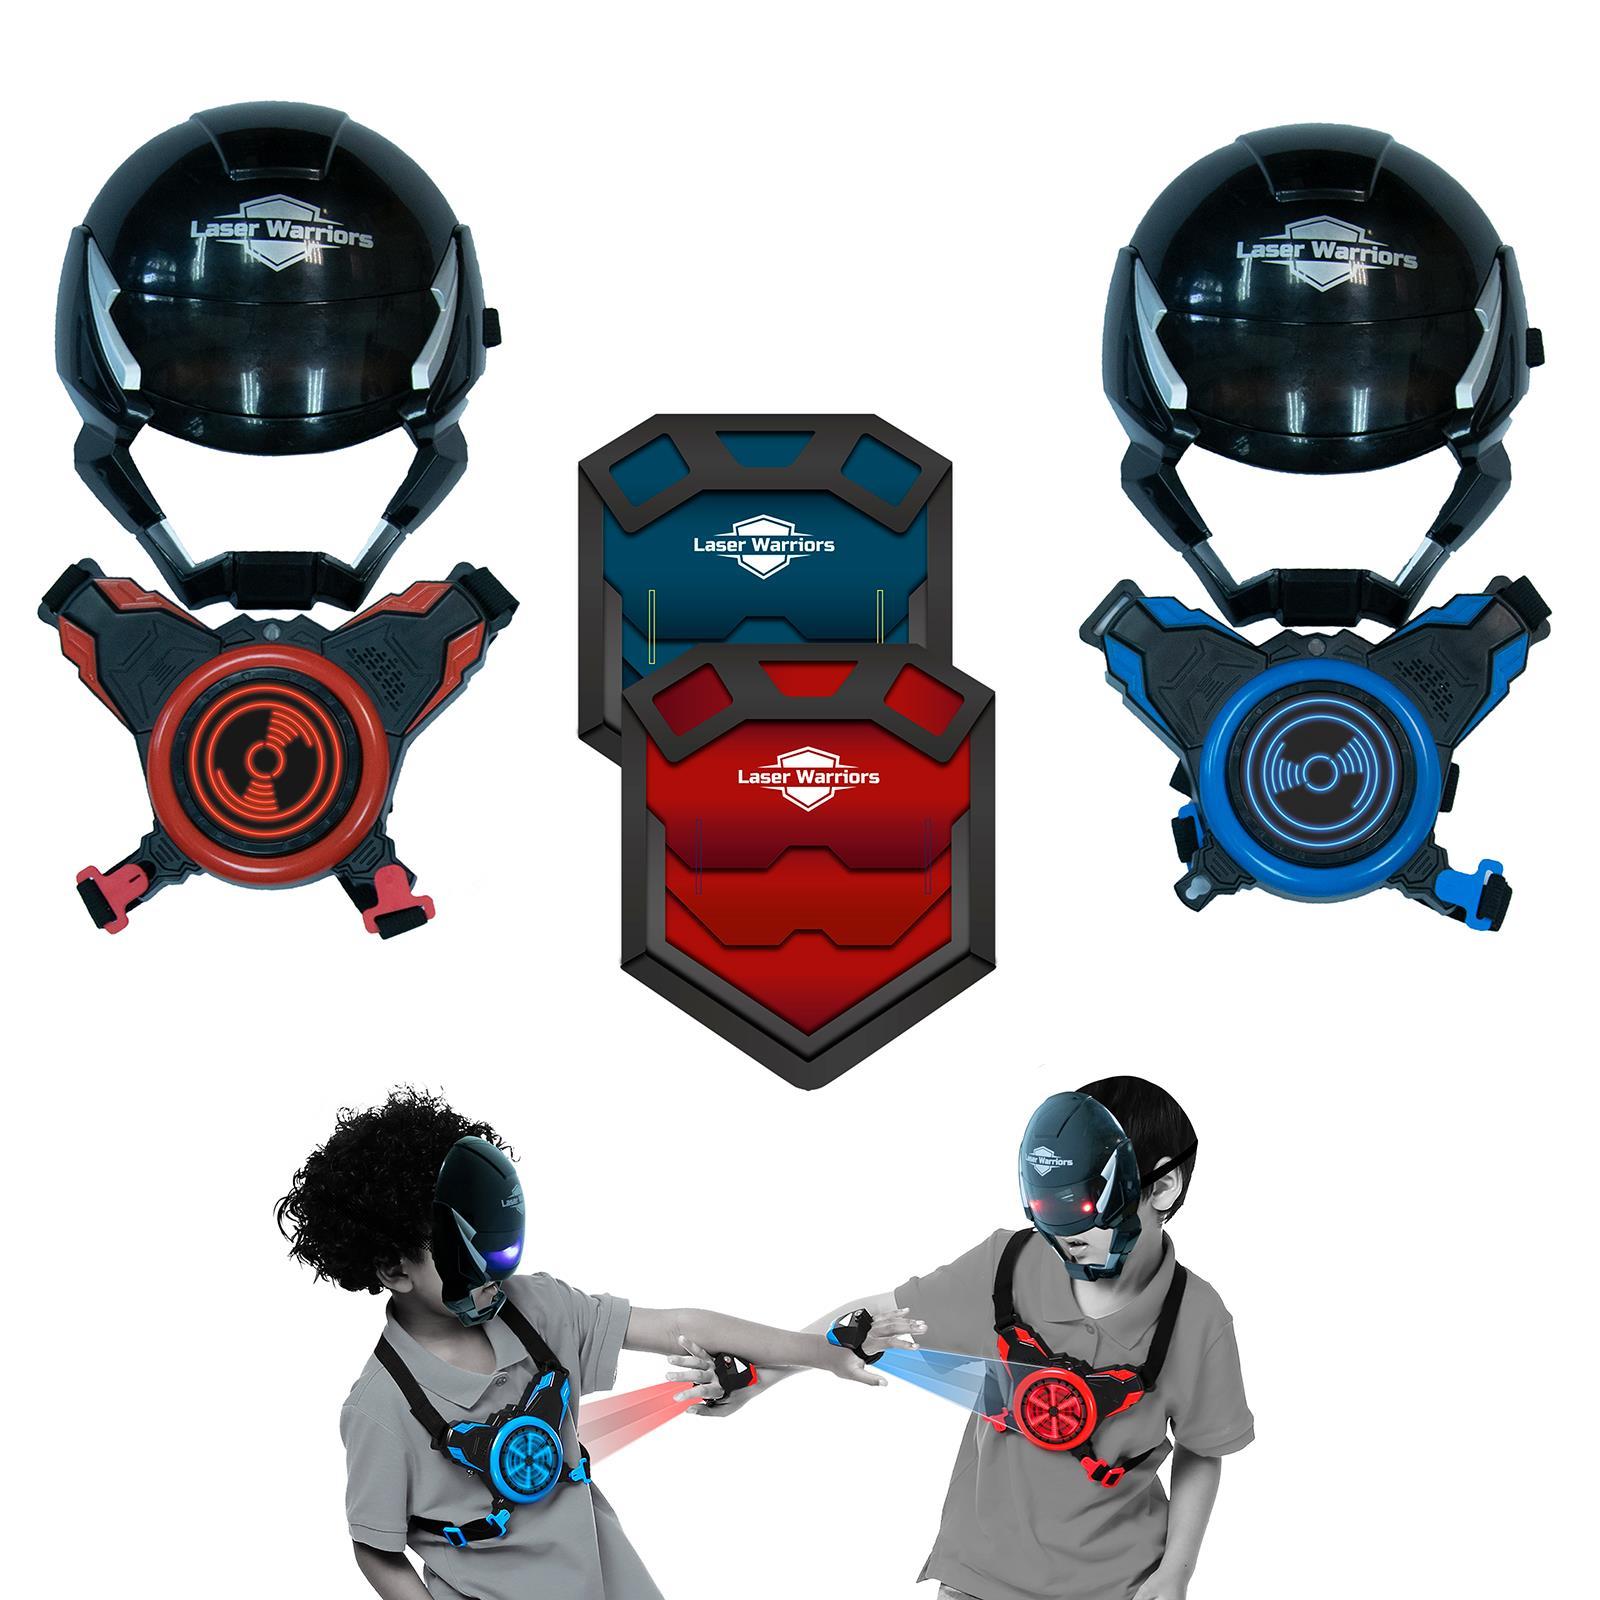 Laserowi Wojownicy Laser Warriors. Technogames